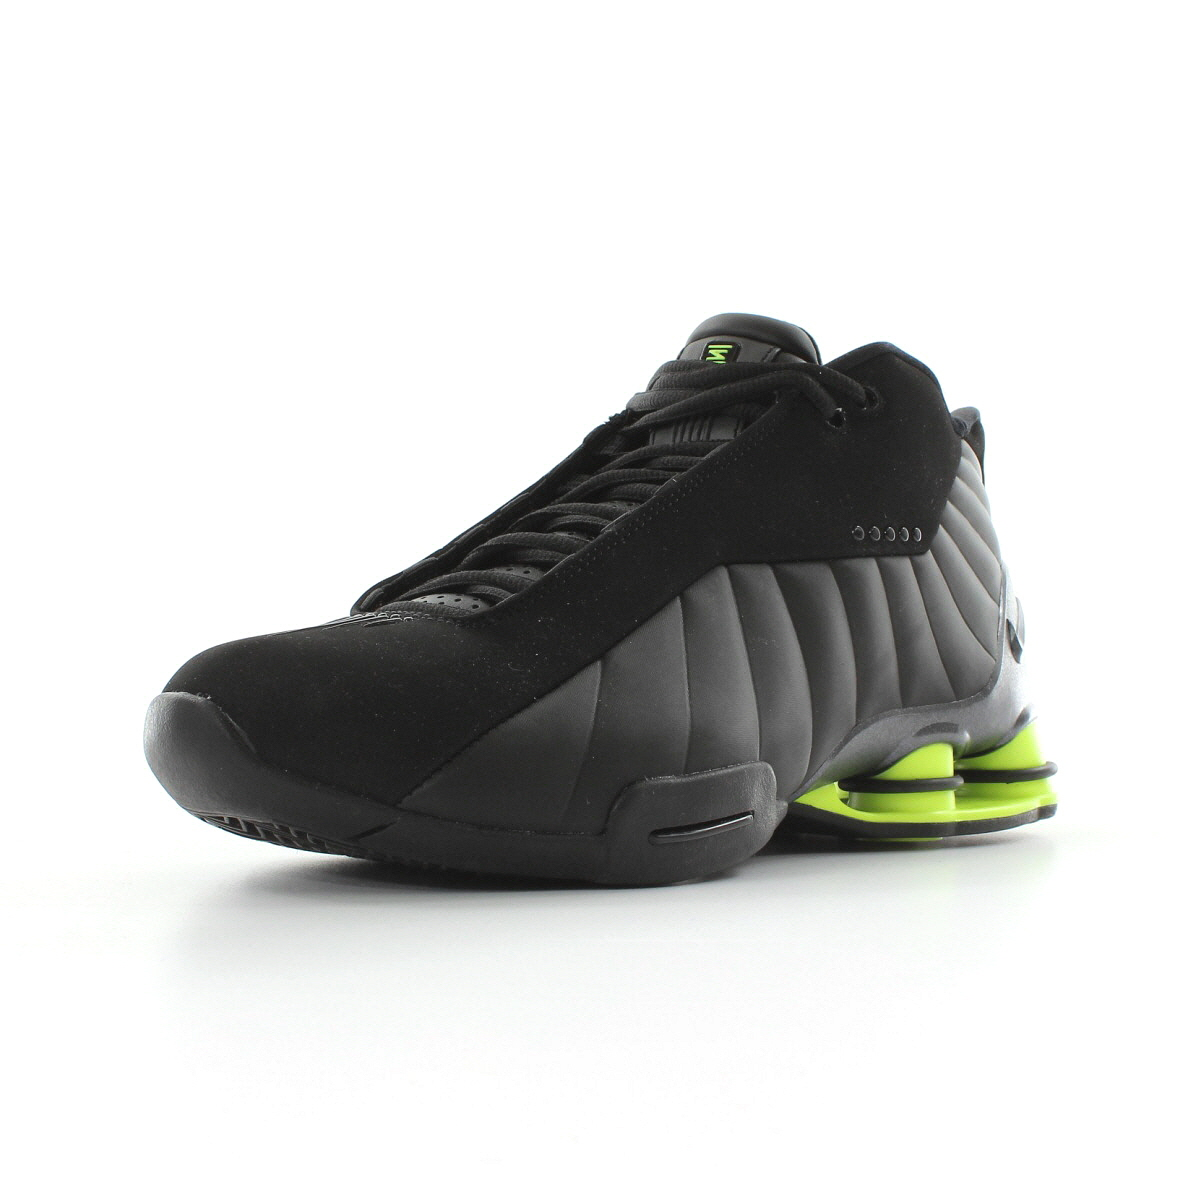 huge discount 51928 ed1db Nike Shox Bb4 Mens Basketball